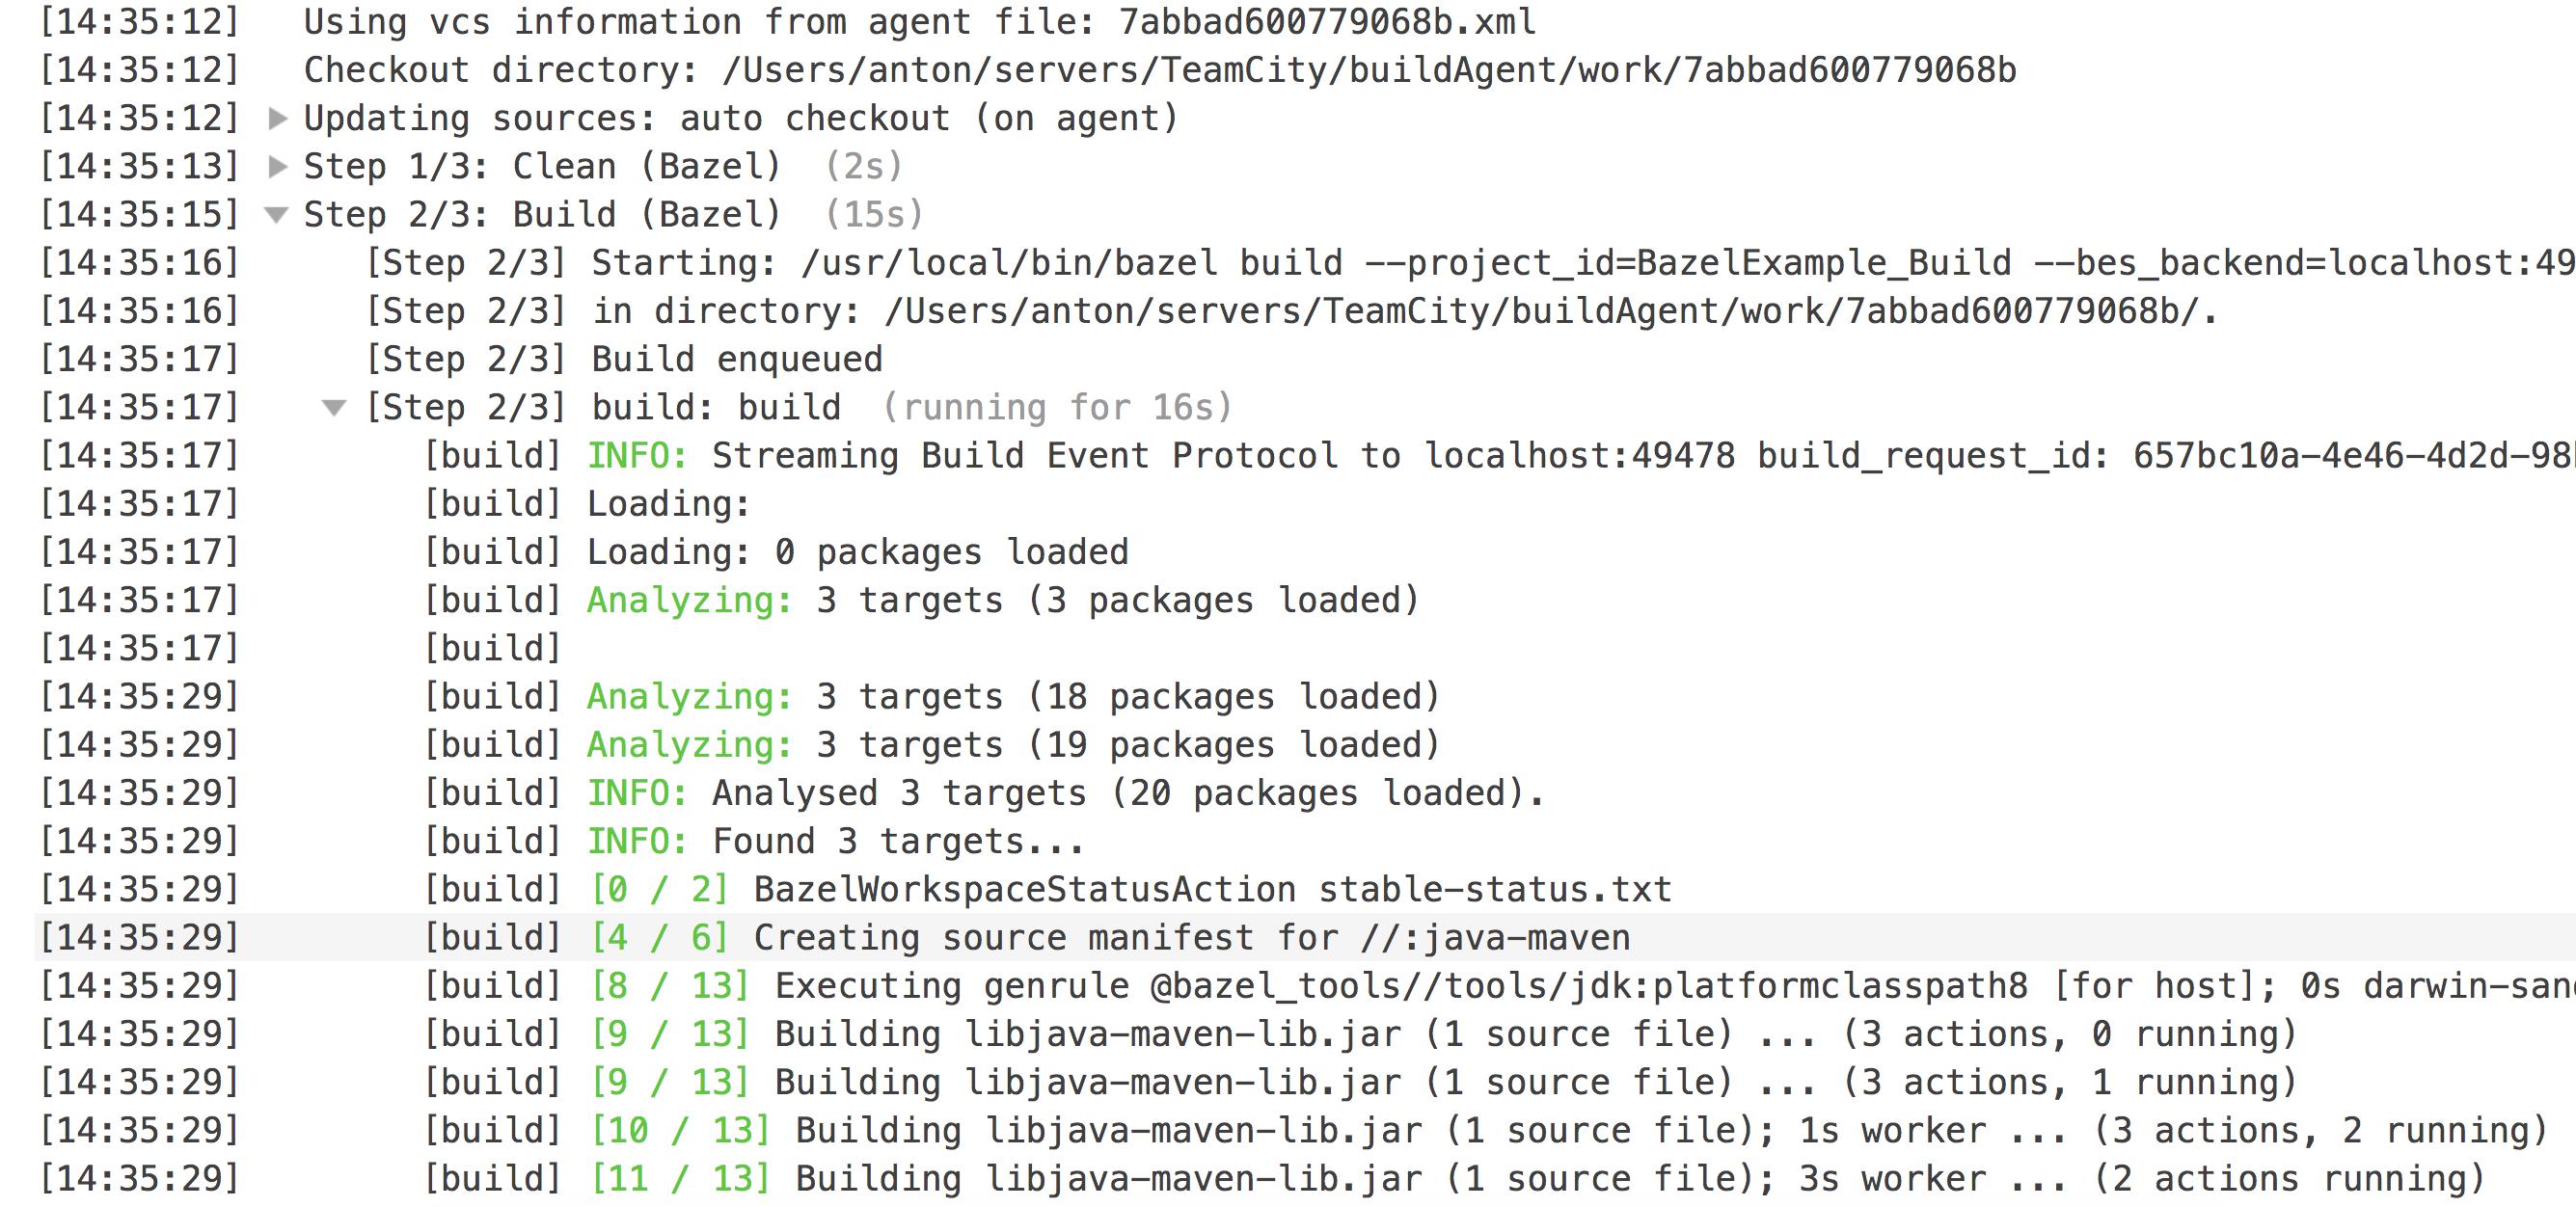 bazel-build-log